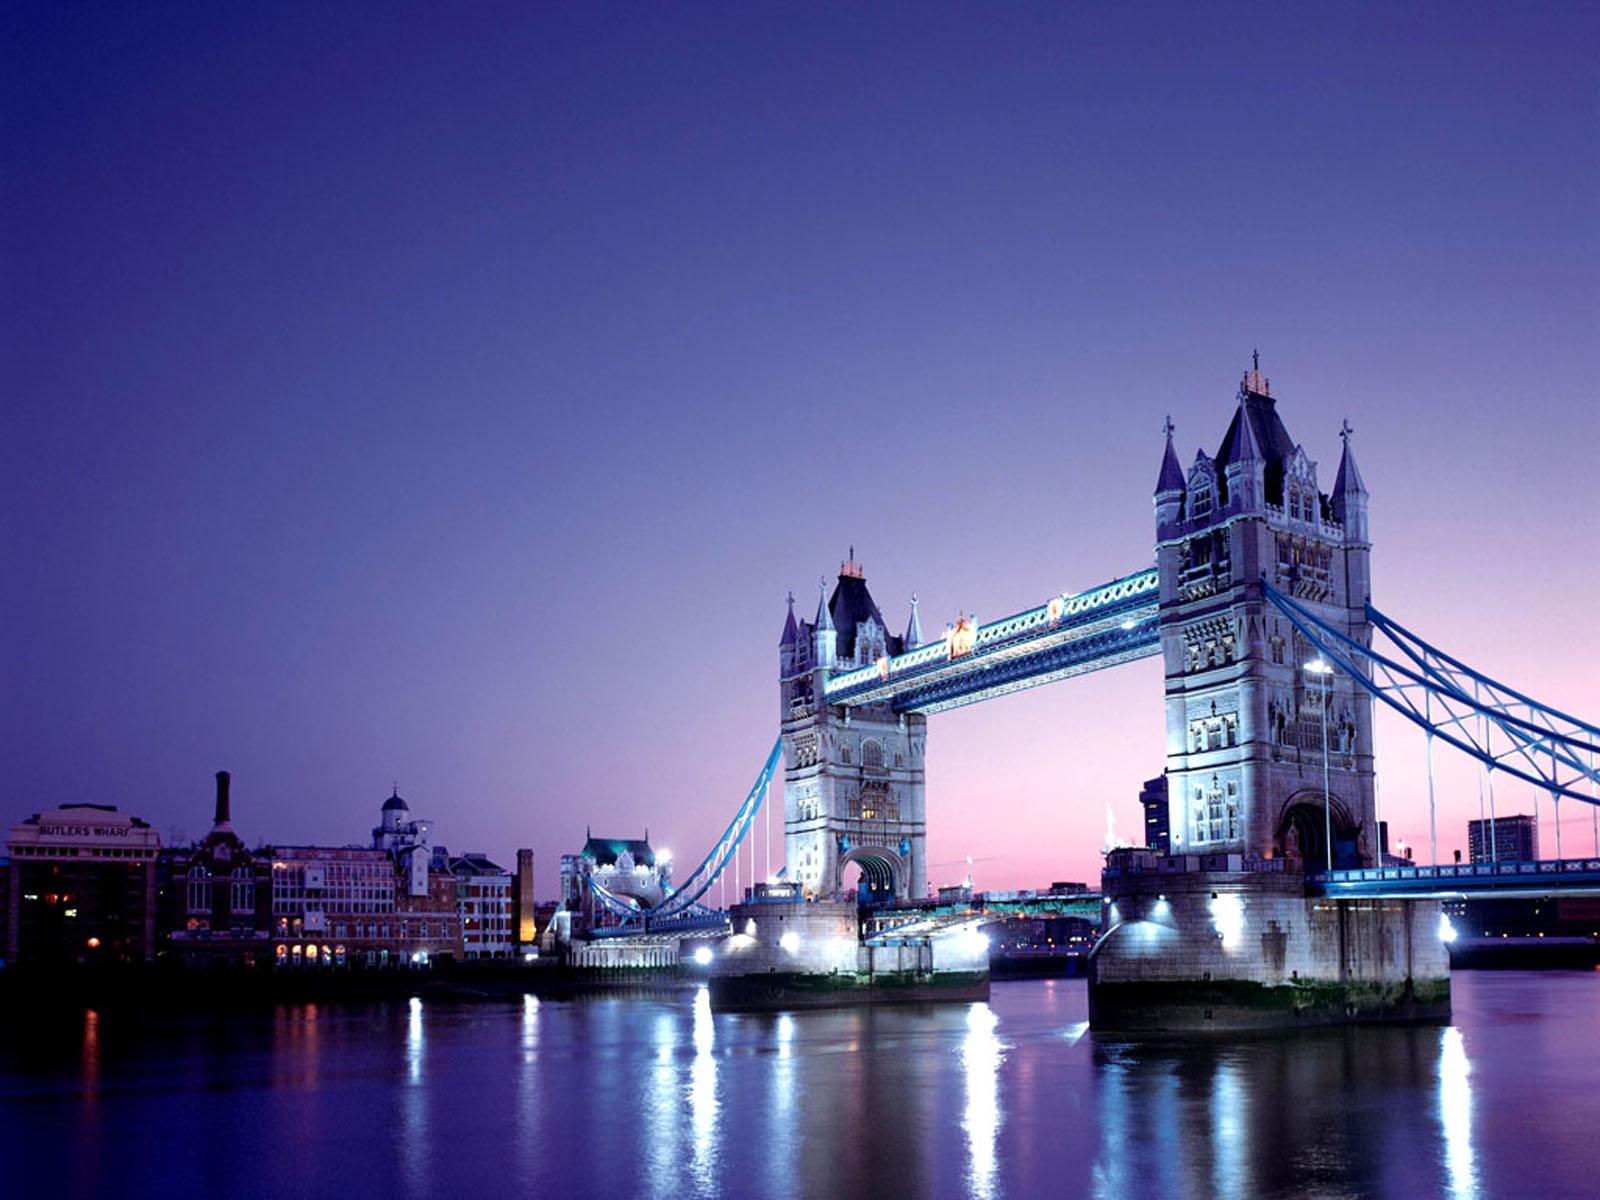 wallpapers: Tower Bridge London Wallpapers